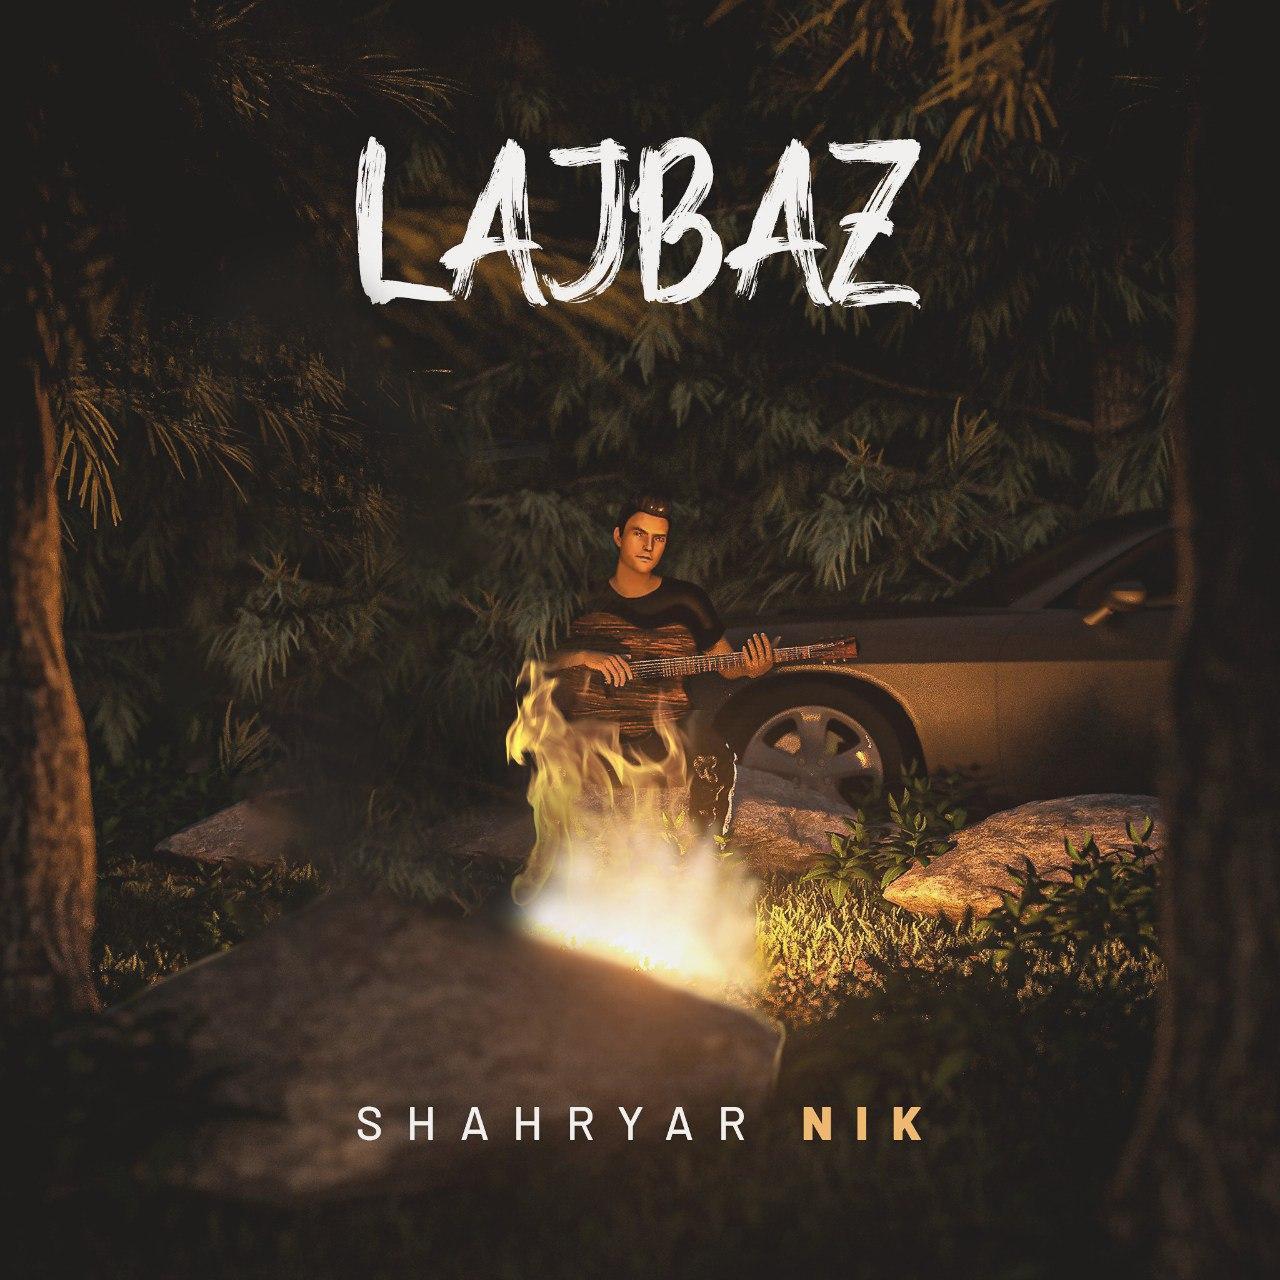 Shahryar Nik – Lajbaz